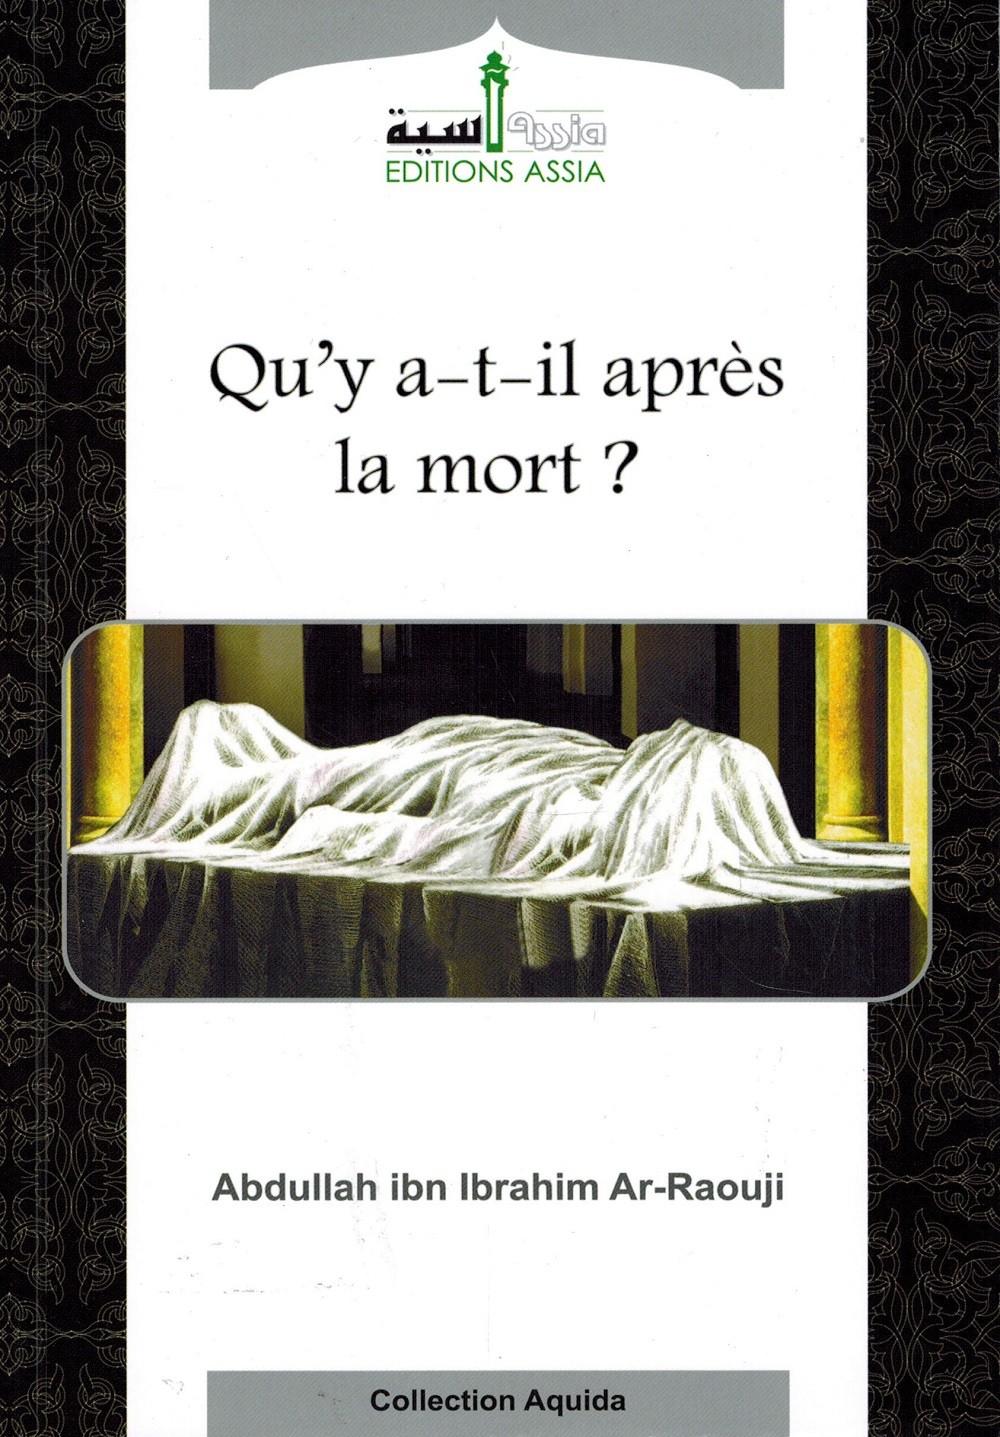 5e6134922ac96_quya-til-aprs-la-mort-Ar-Raouji